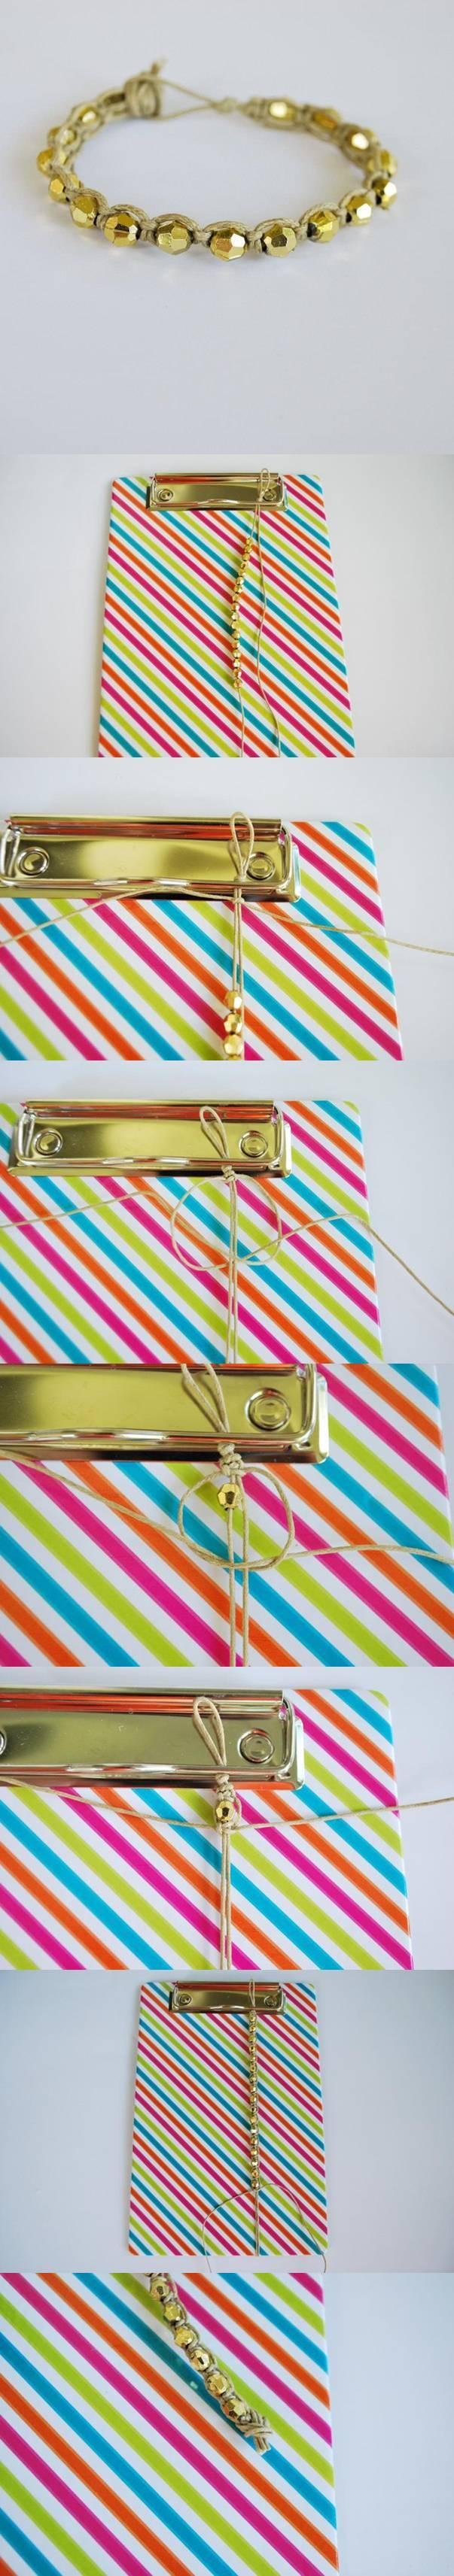 diy, gold, beads, wristband, tutorial